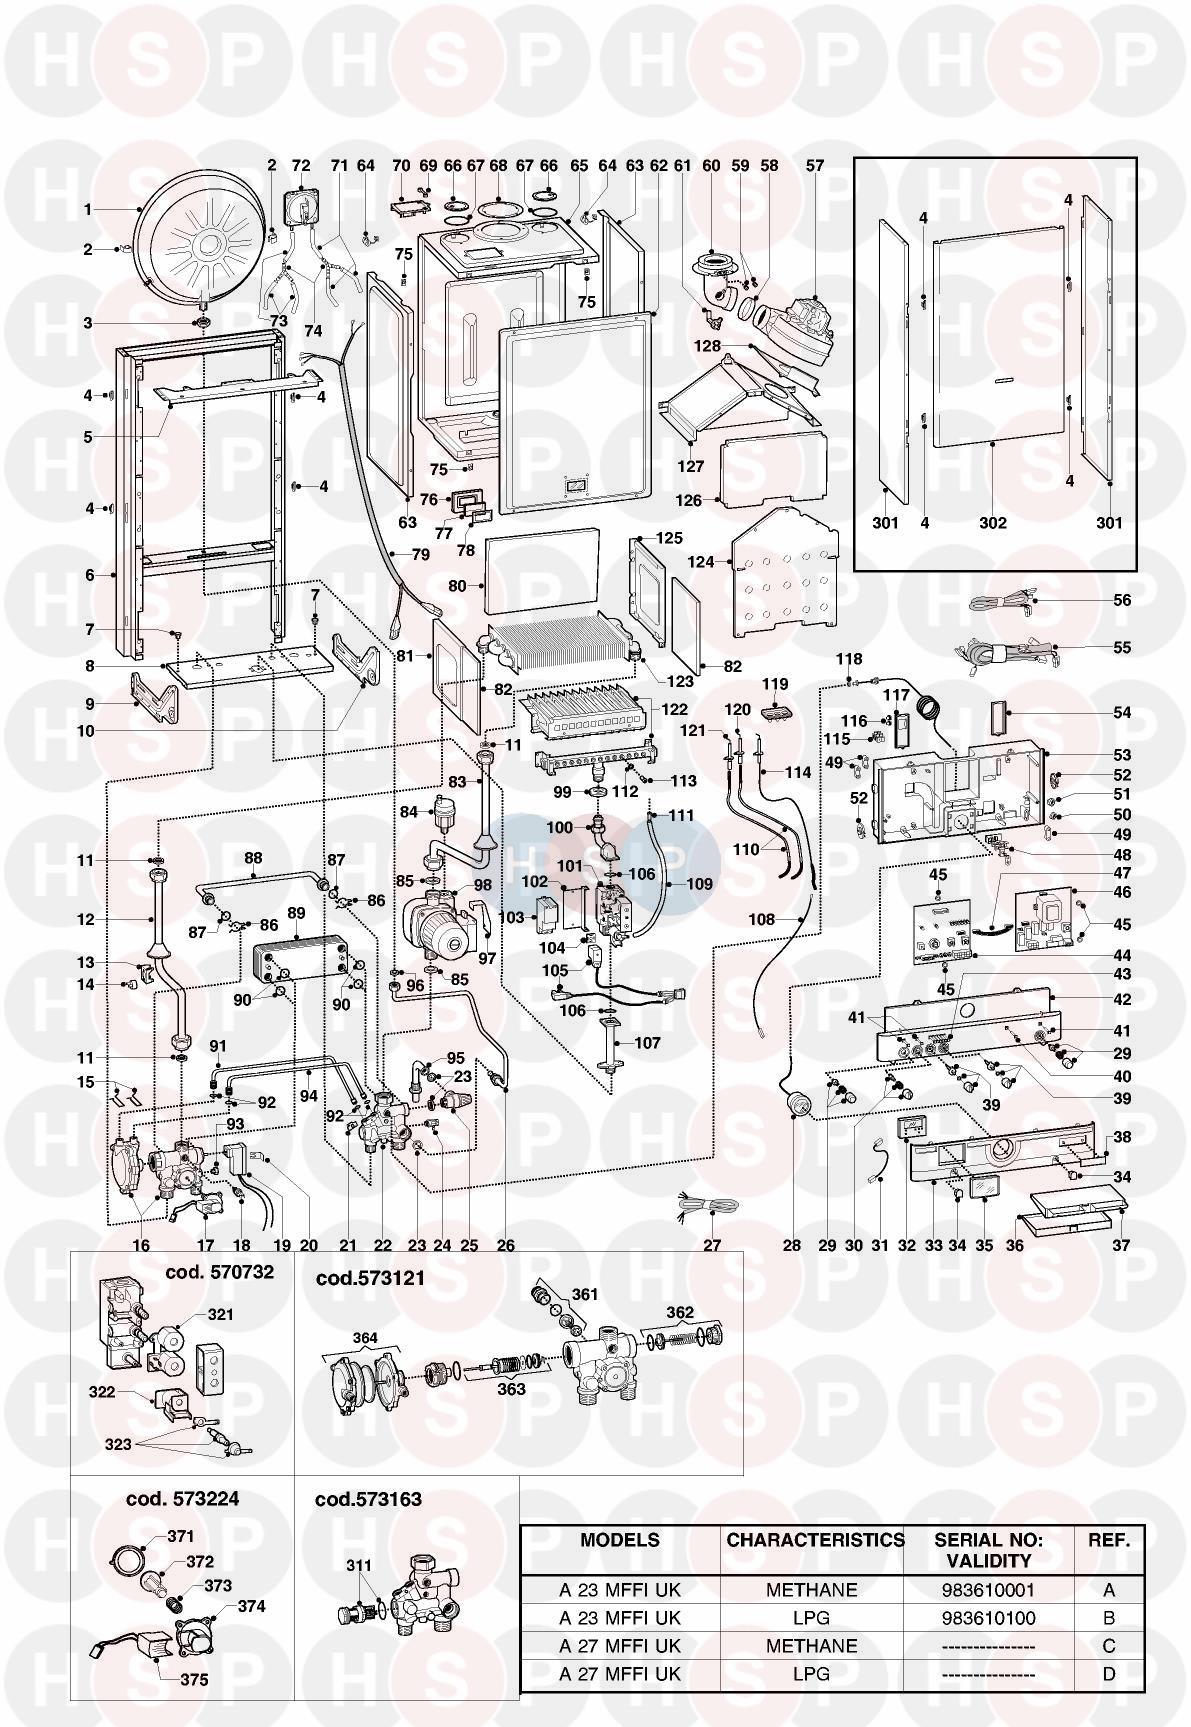 Ariston Eurocombi A23 Mffi Edition2 Appliance Diagram